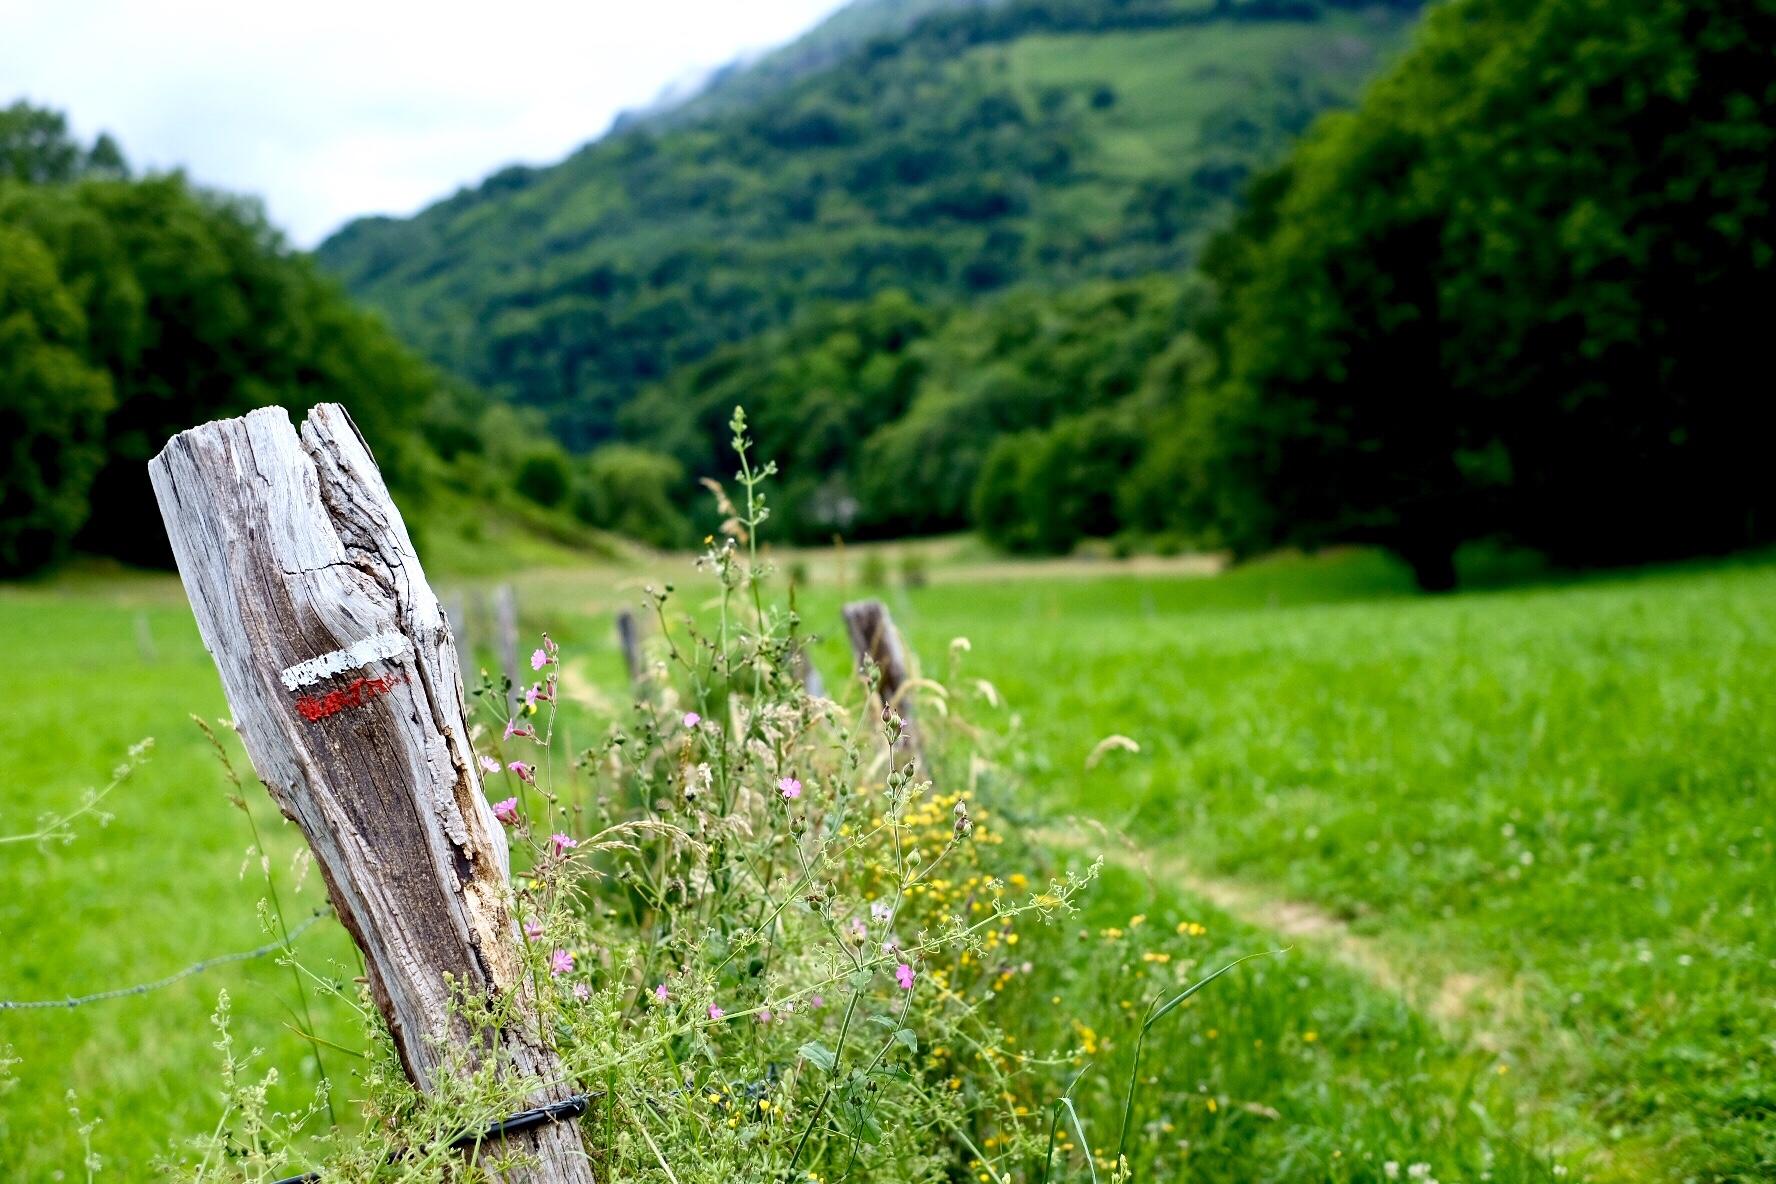 The Camino Aragones: the perfect Camino